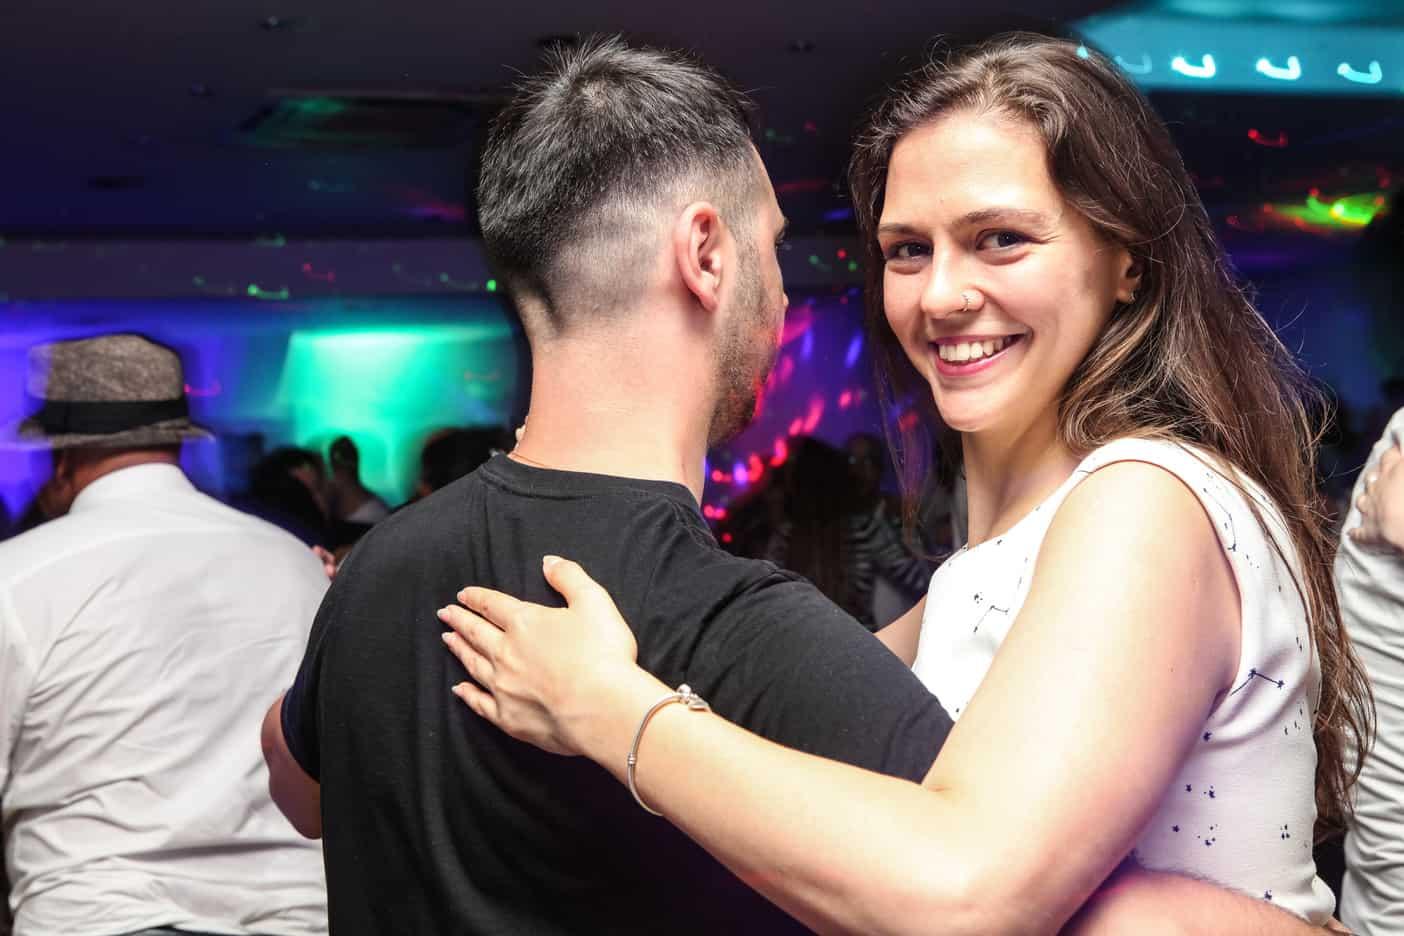 women smiling while dancing